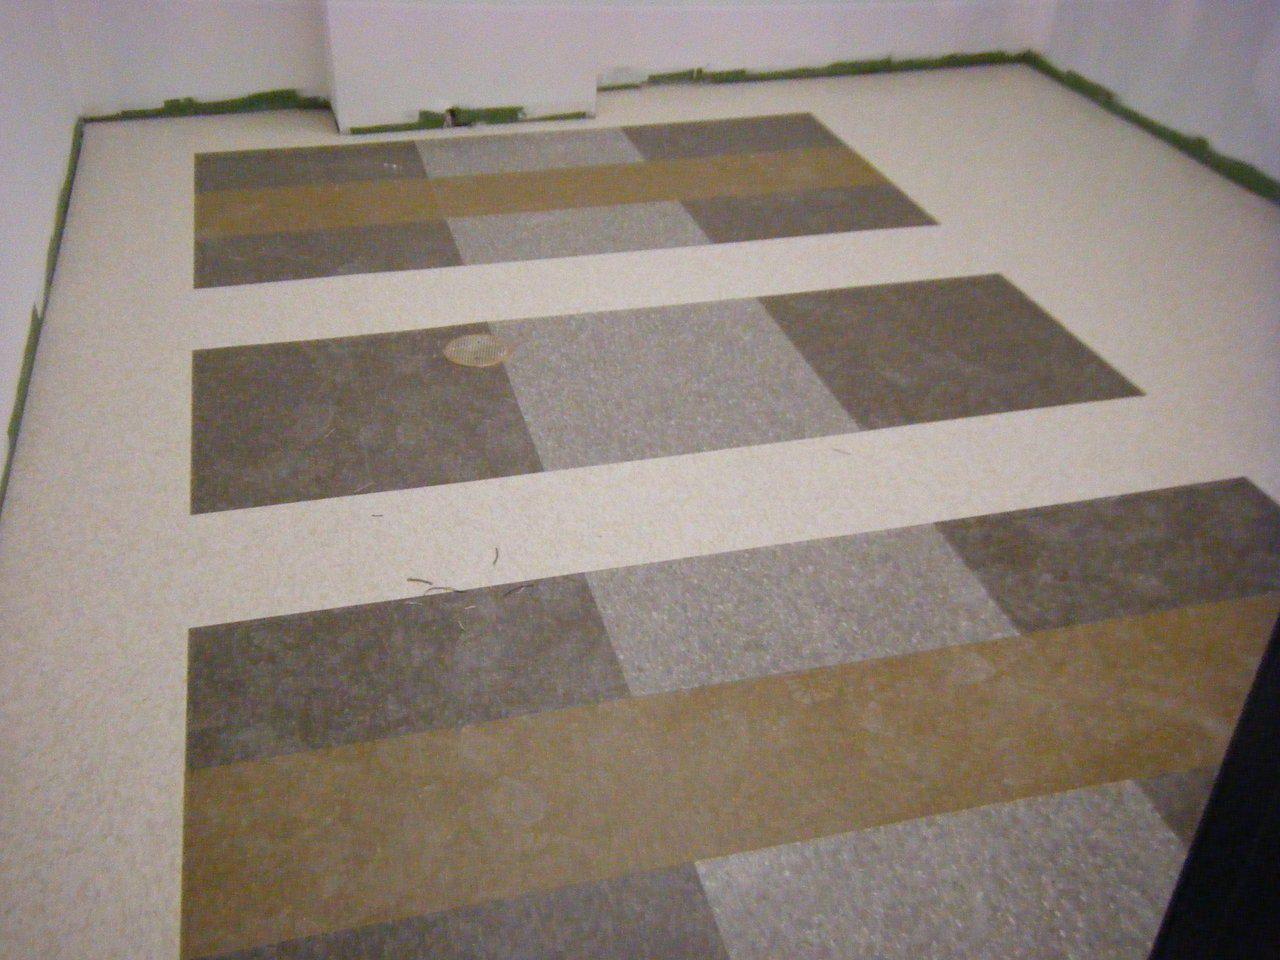 modern carpet tile patterns. VCT Pattern: Reminds Me Of Carpet Tiles - Modern Tile Patterns O